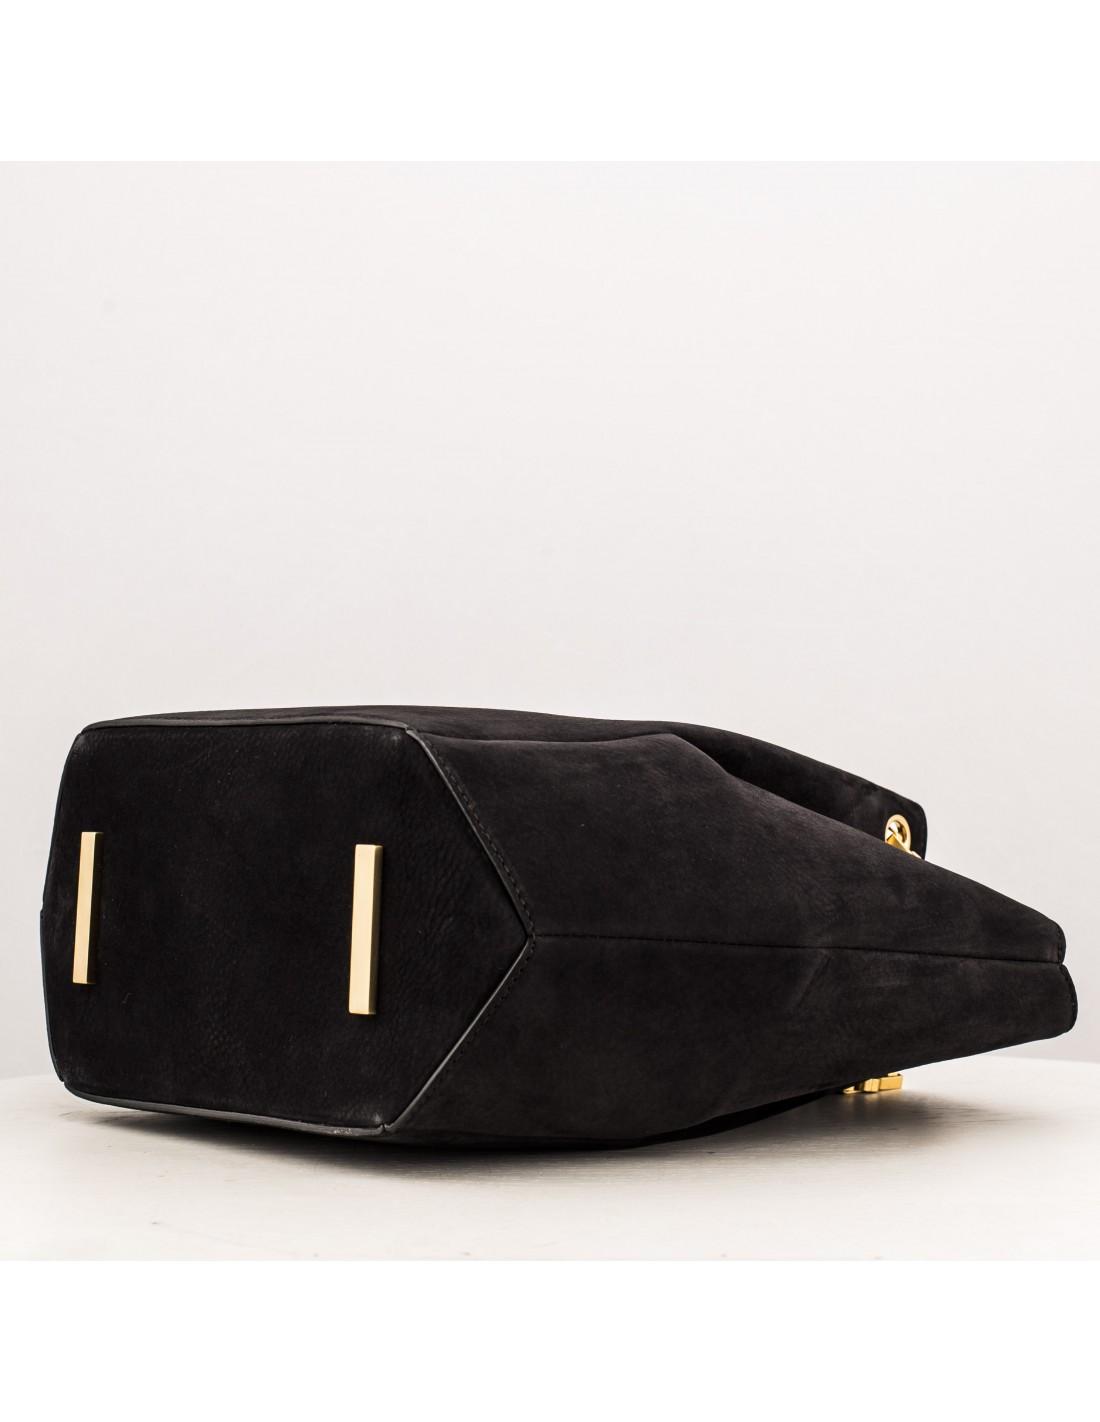 74b46bba0b77 LC.2-23 – Nero - LABRUYERE luxury handbag